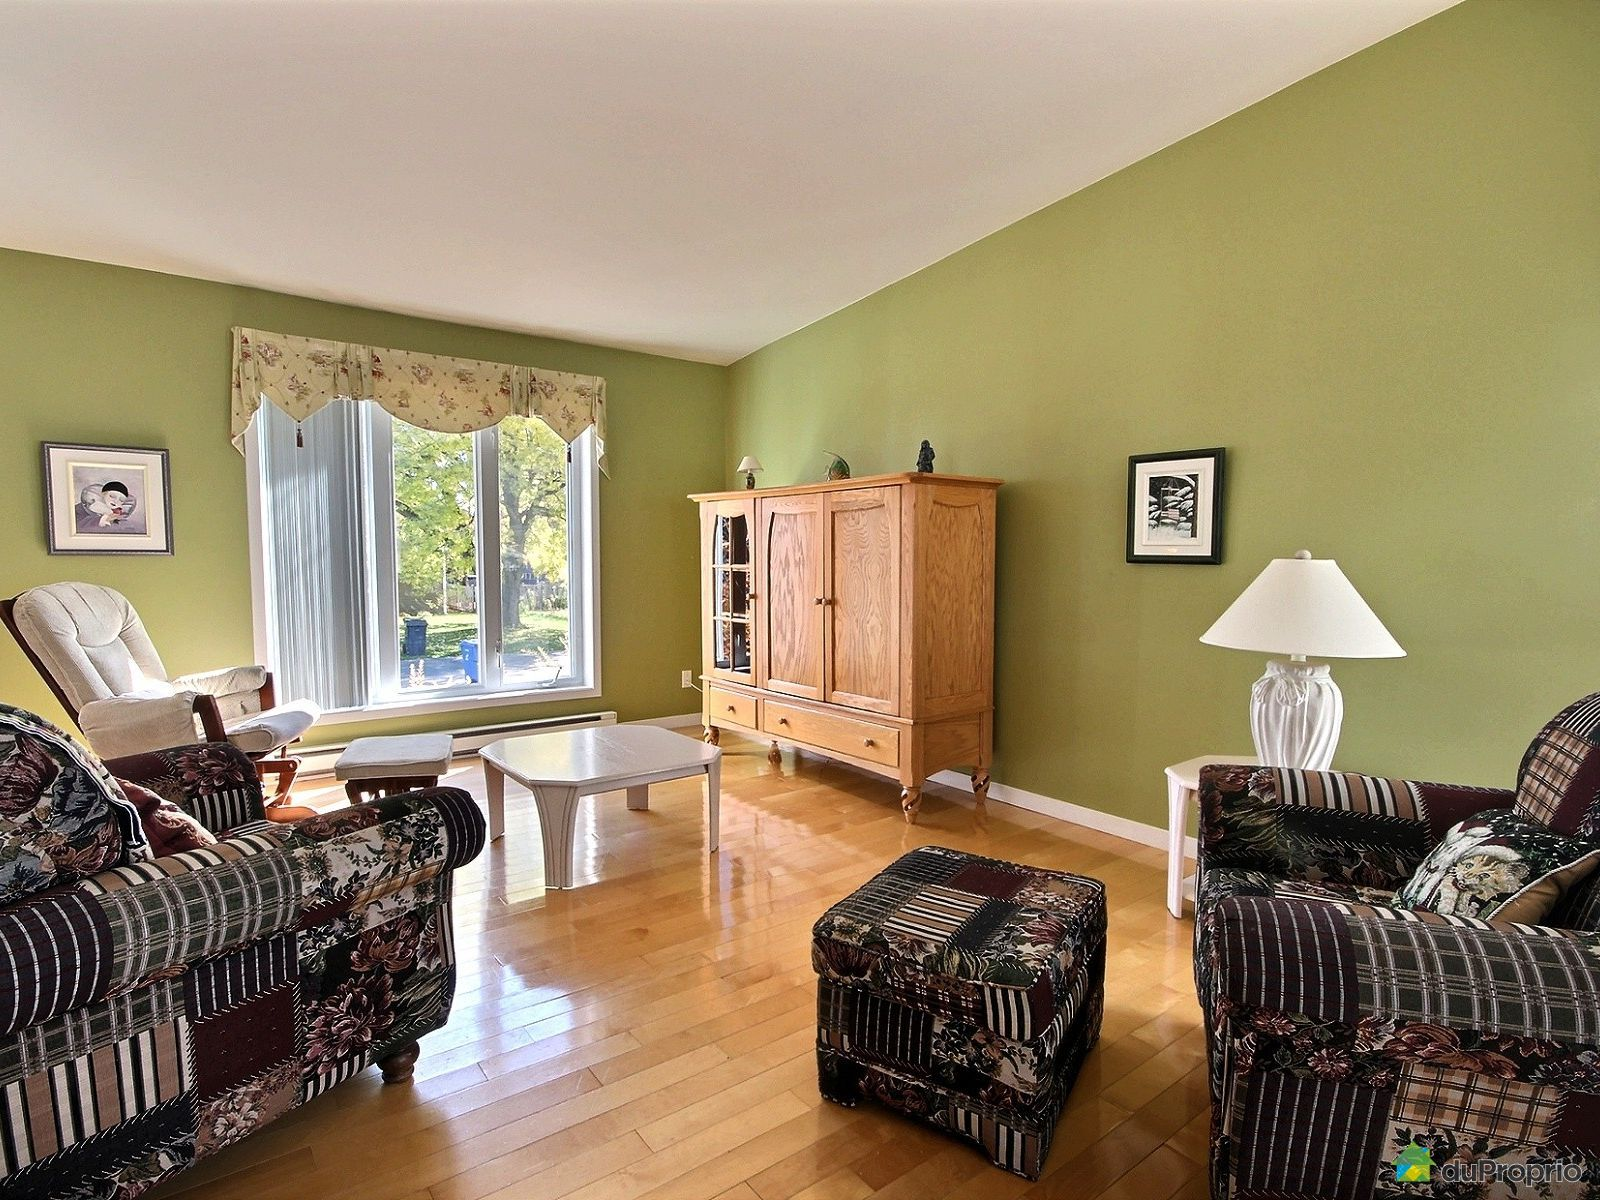 maison vendu val b lair immobilier qu bec duproprio 656877. Black Bedroom Furniture Sets. Home Design Ideas